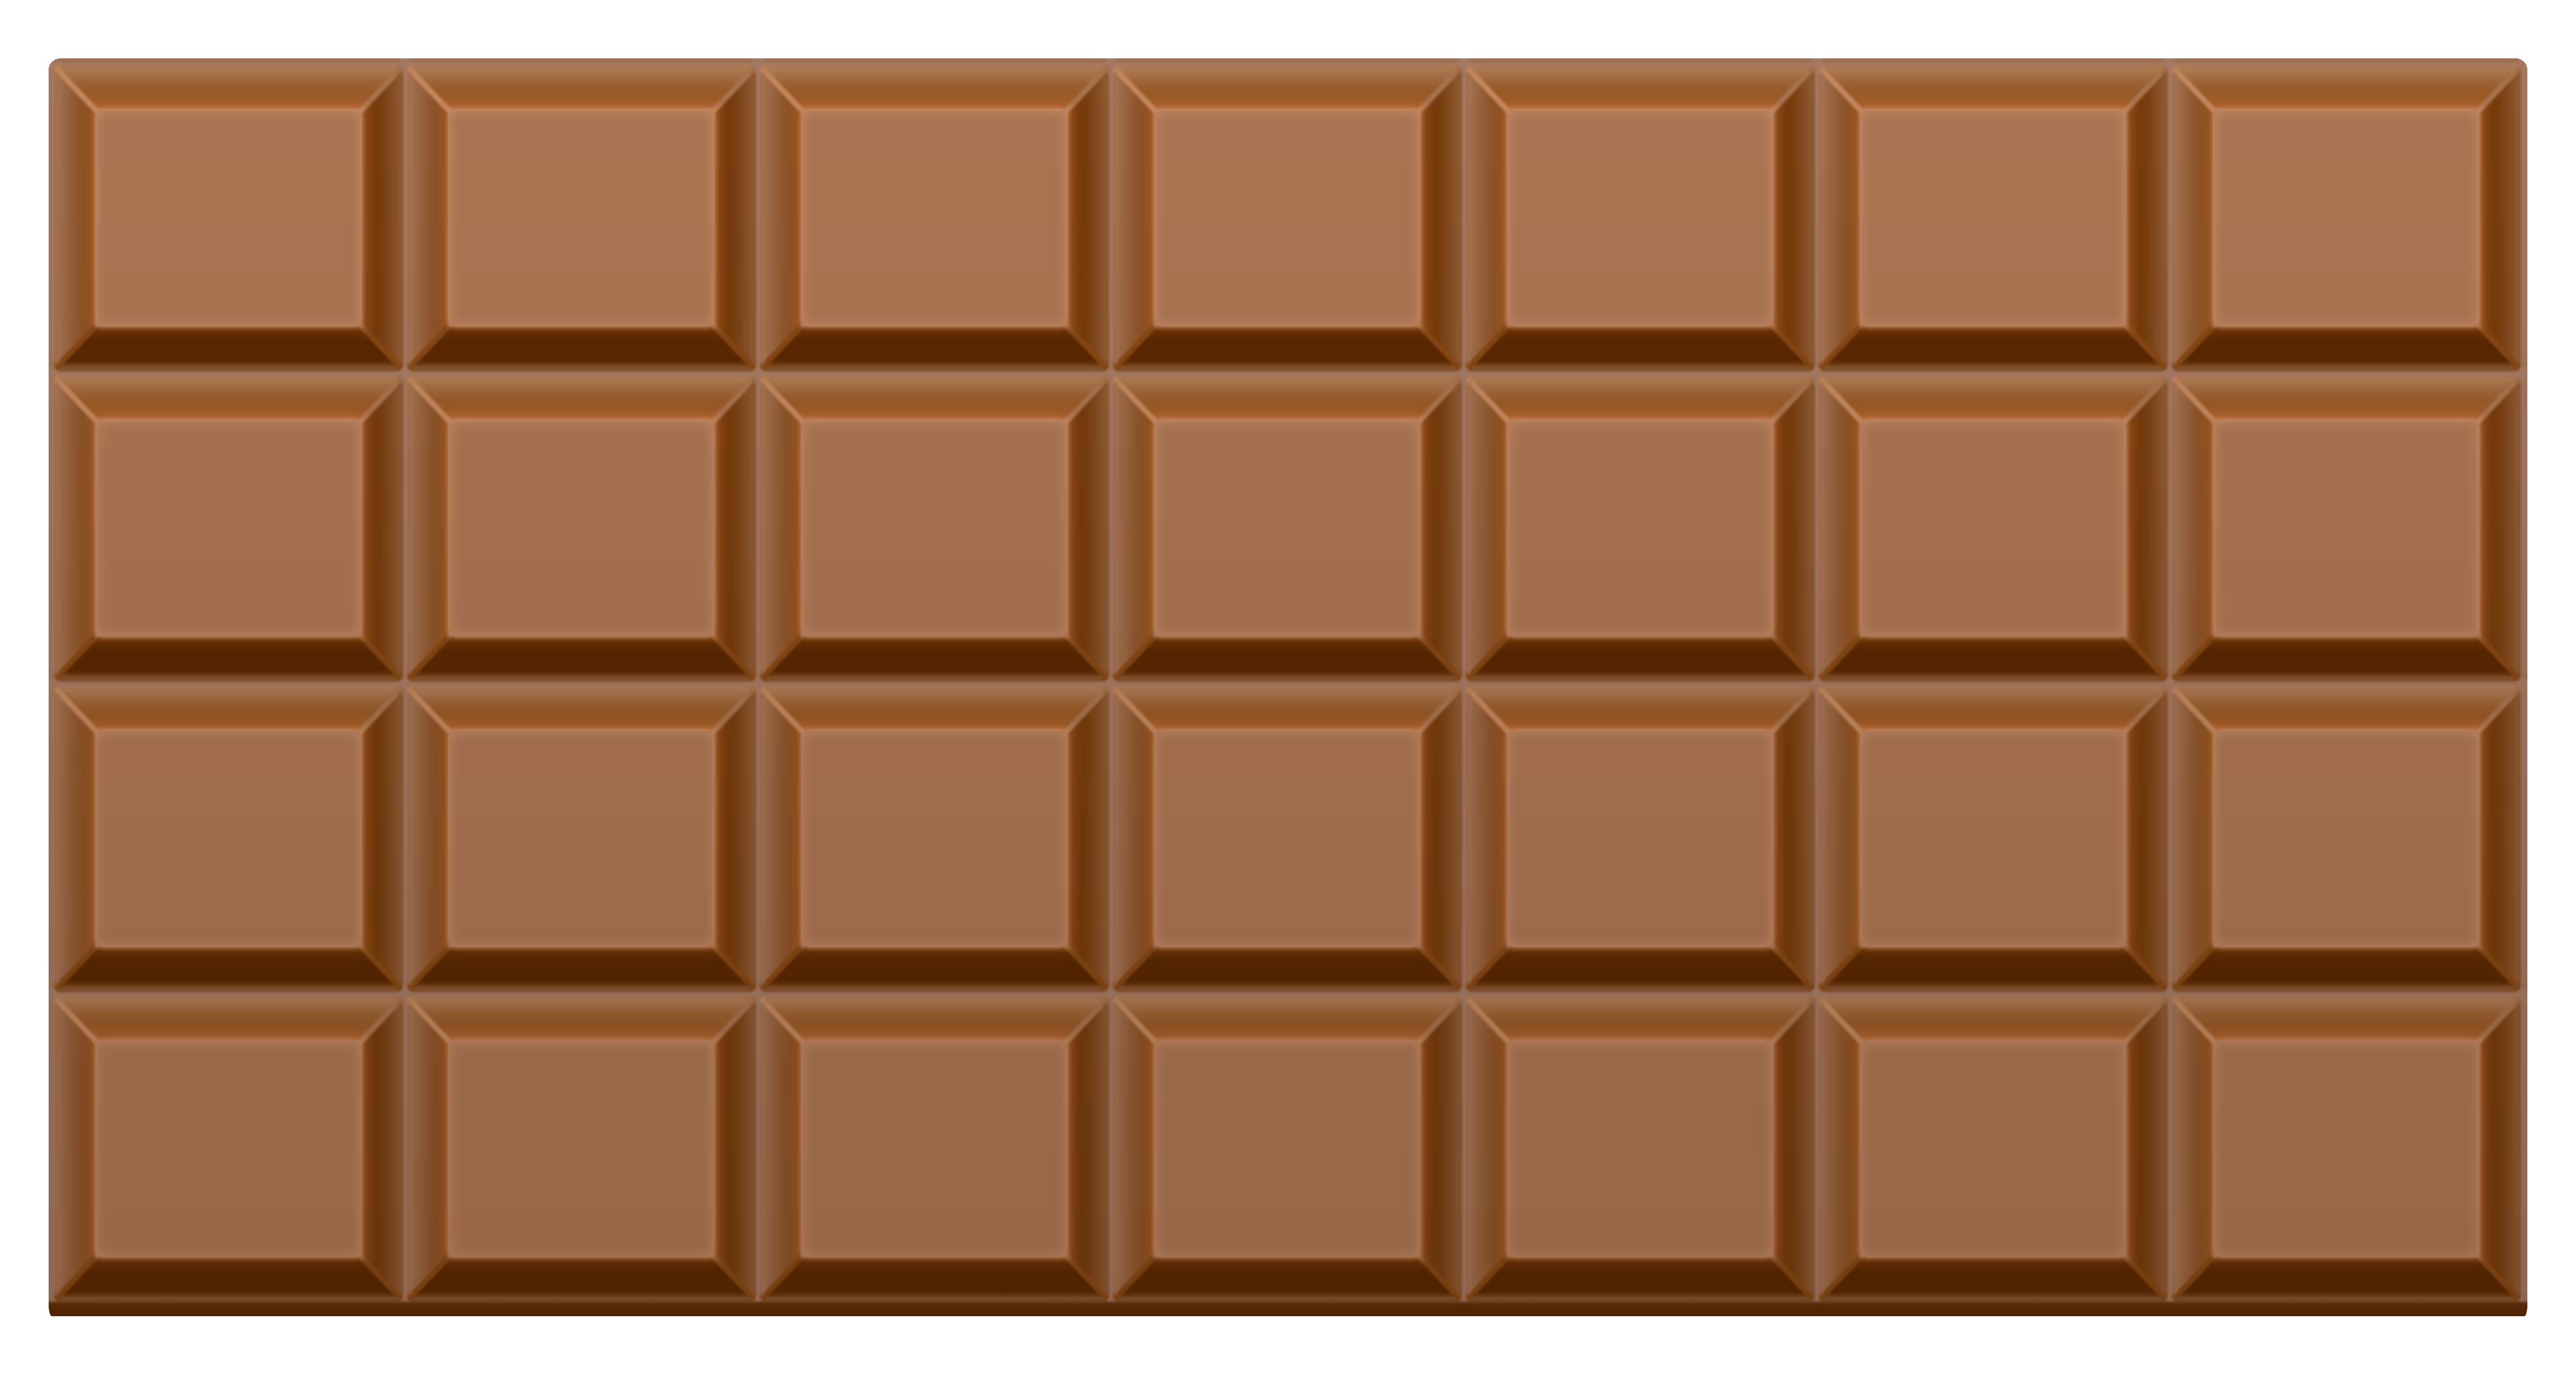 Chocolate bar PNG image - Chocolate HD PNG